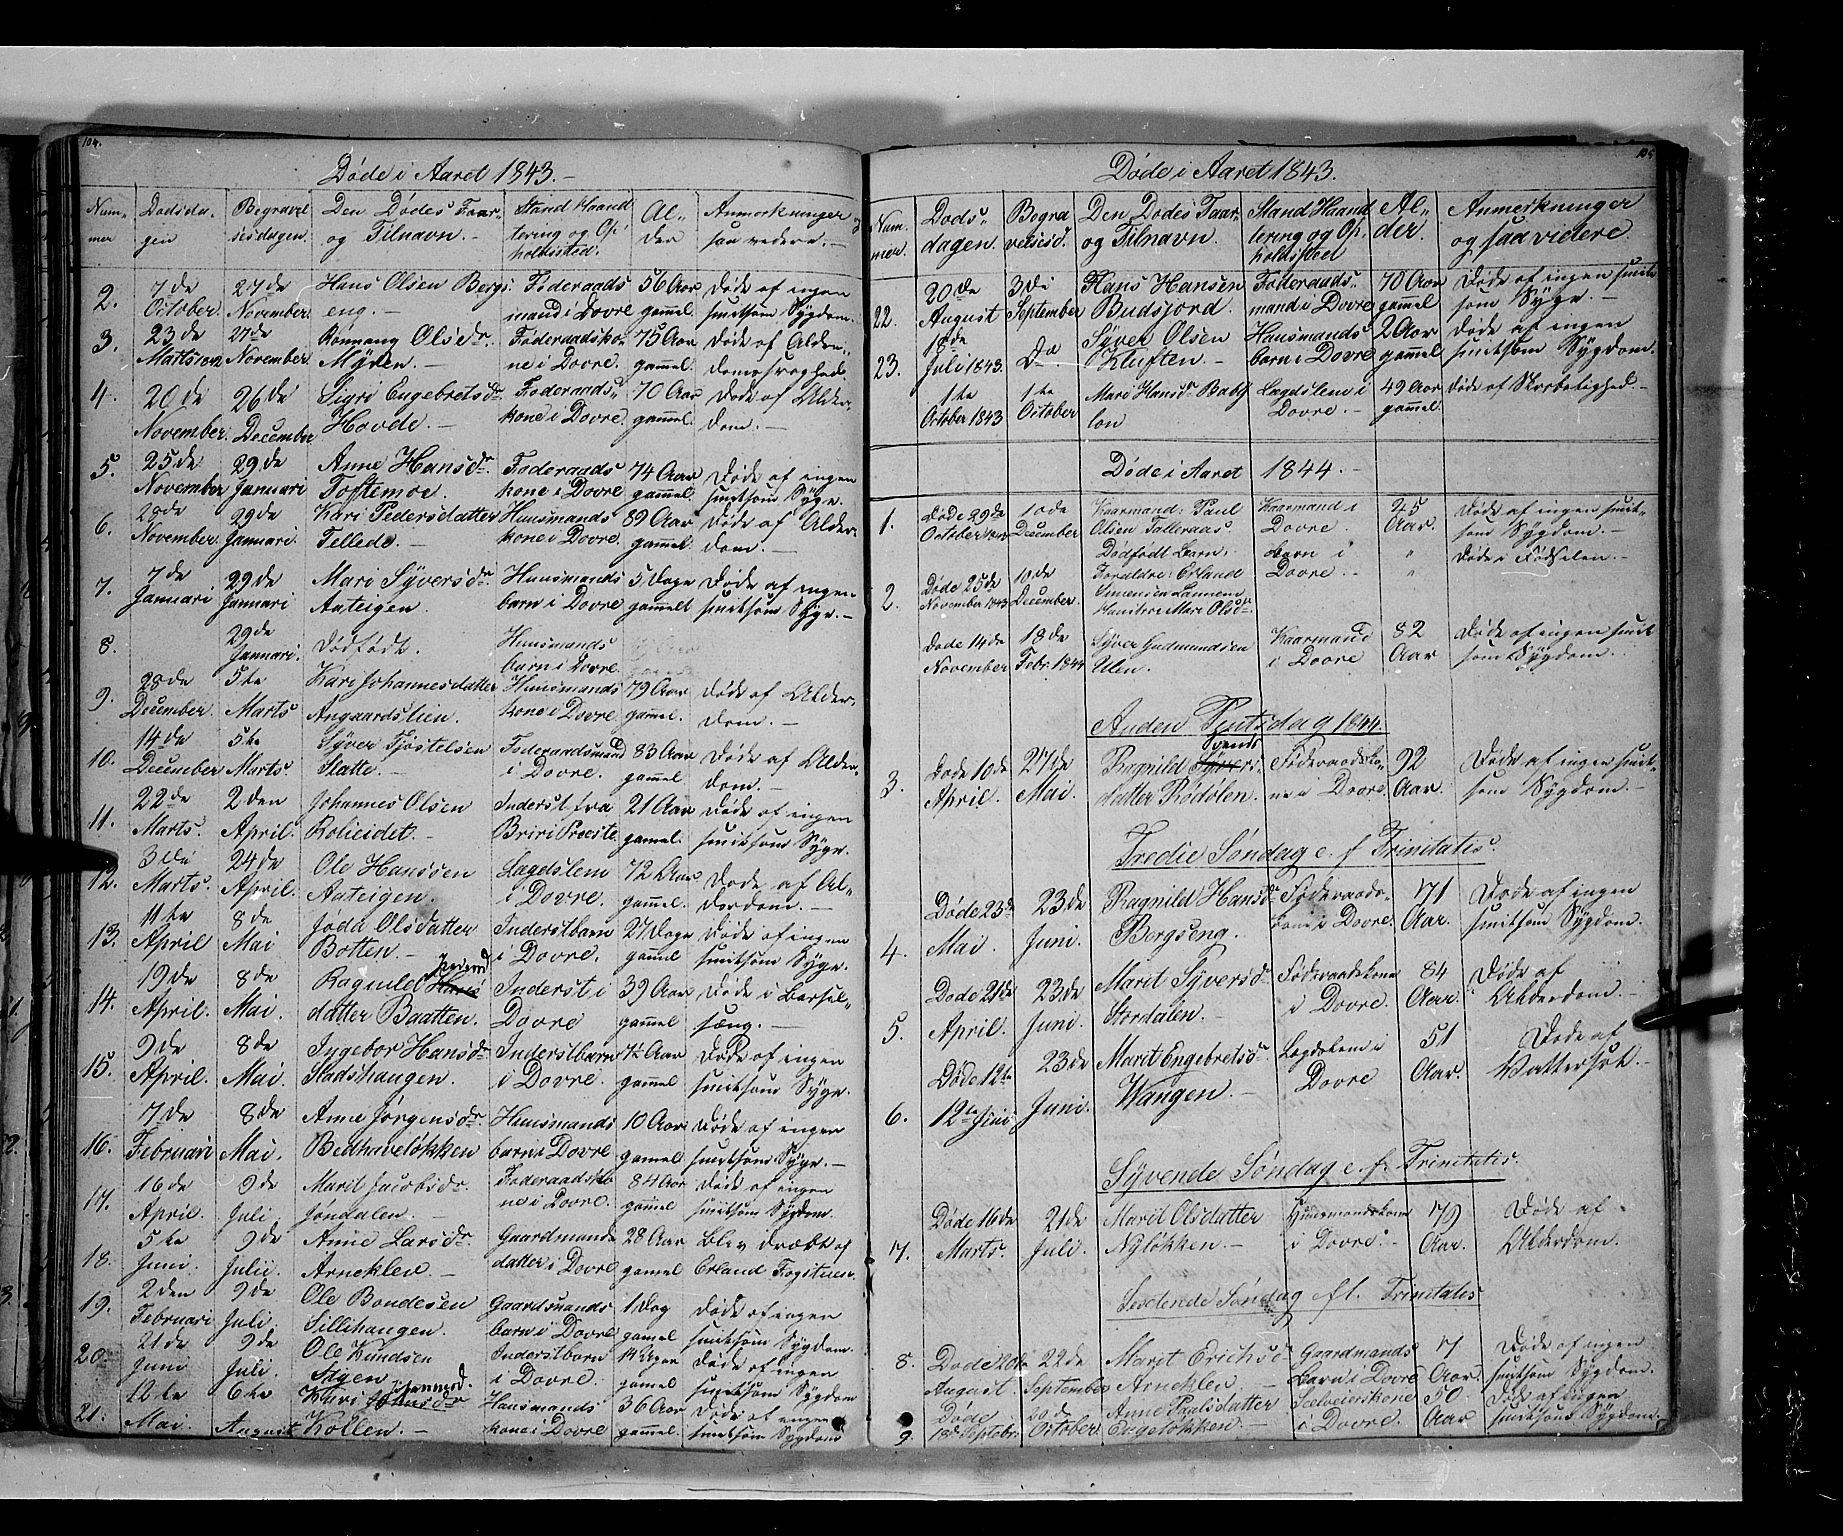 SAH, Lesja prestekontor, Klokkerbok nr. 3, 1842-1862, s. 104-105